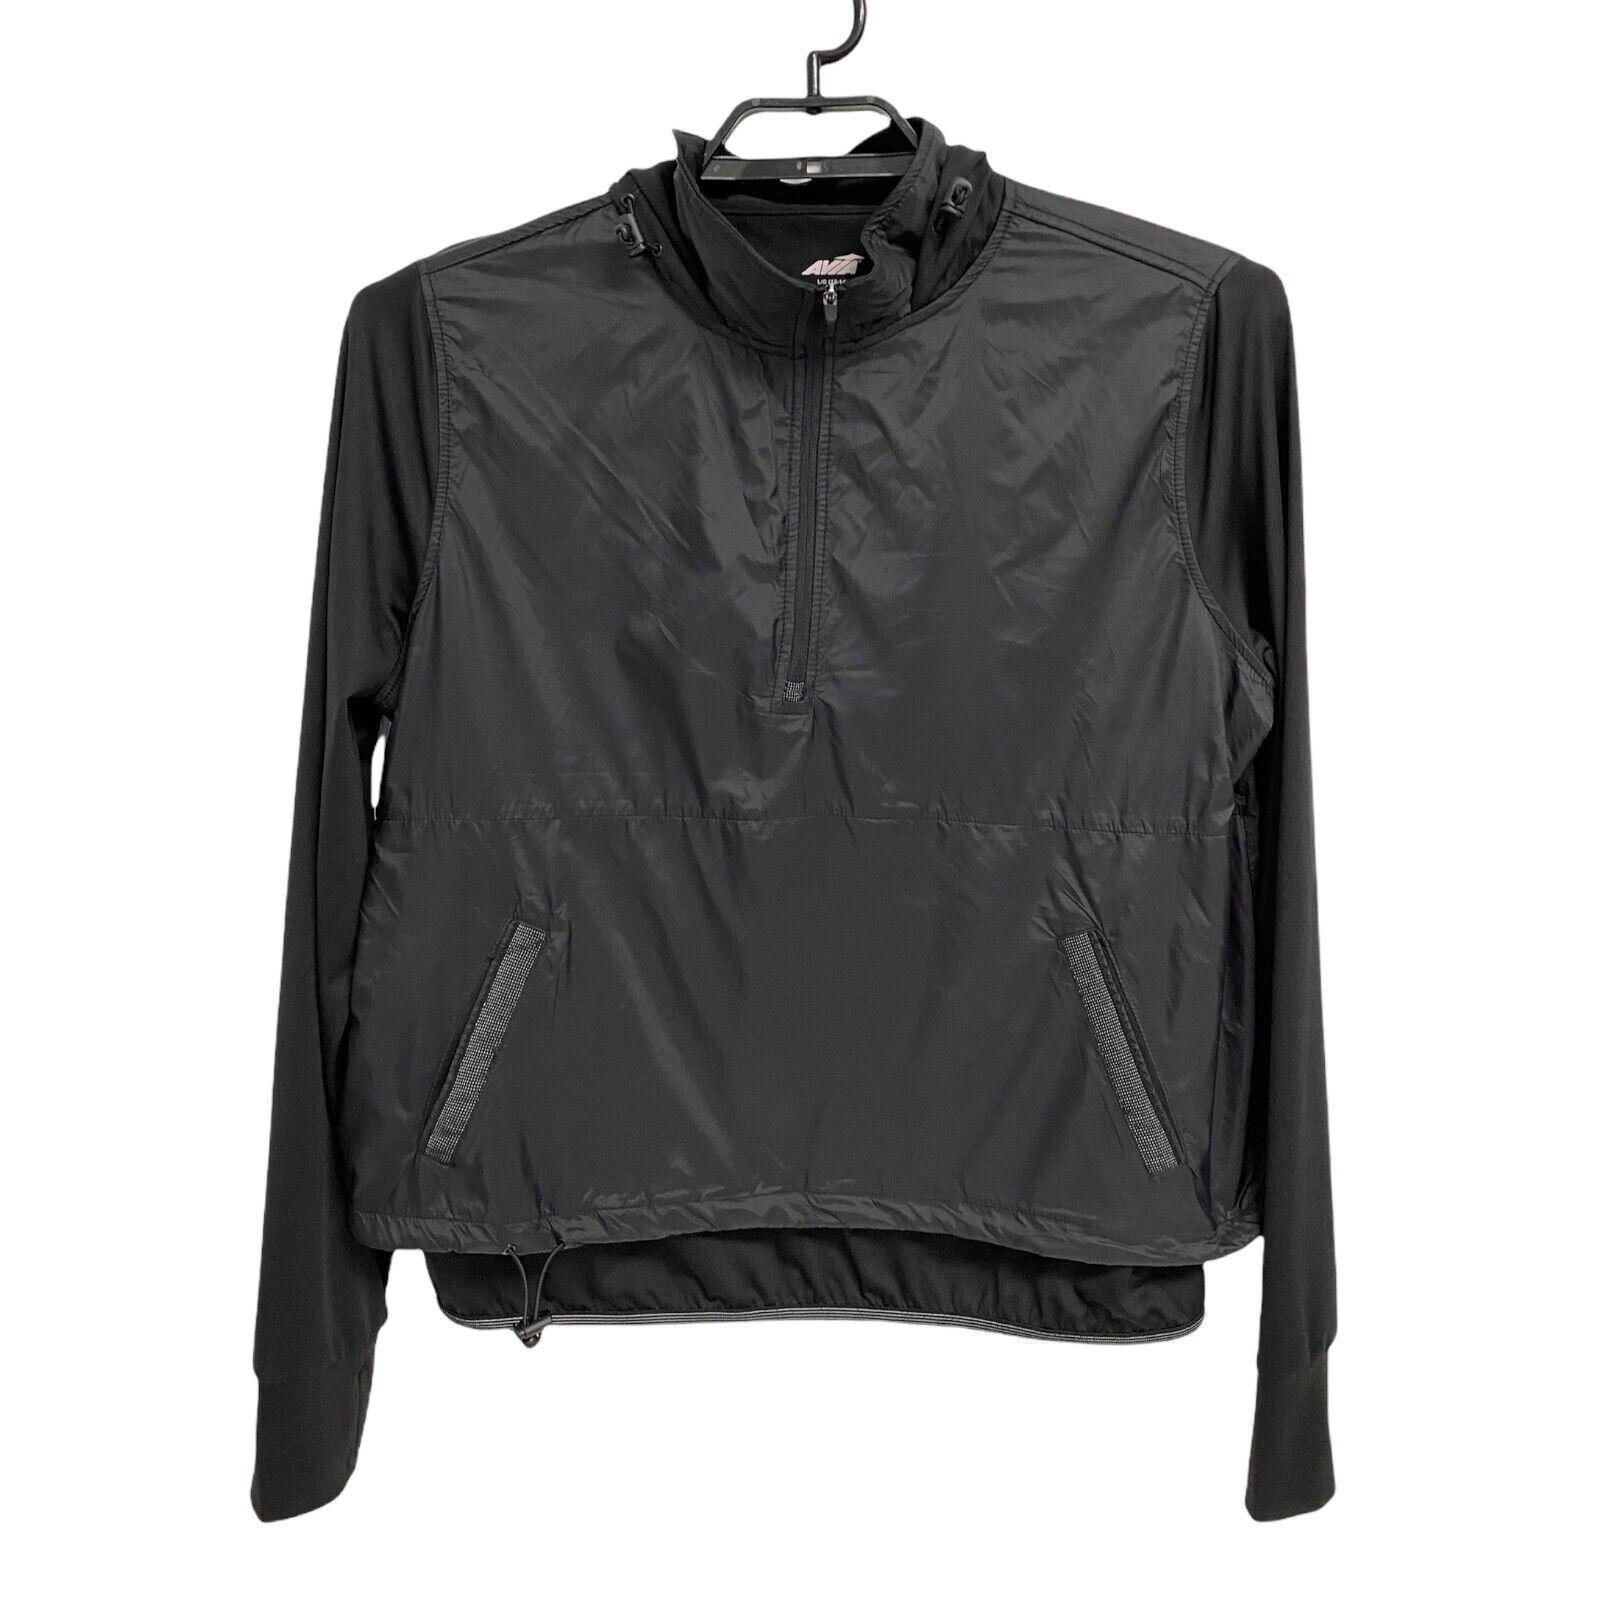 Avia Damen Sportbekleidung Jacke Schwarz Halb Reißverschluss Kapuze Größe L/G (